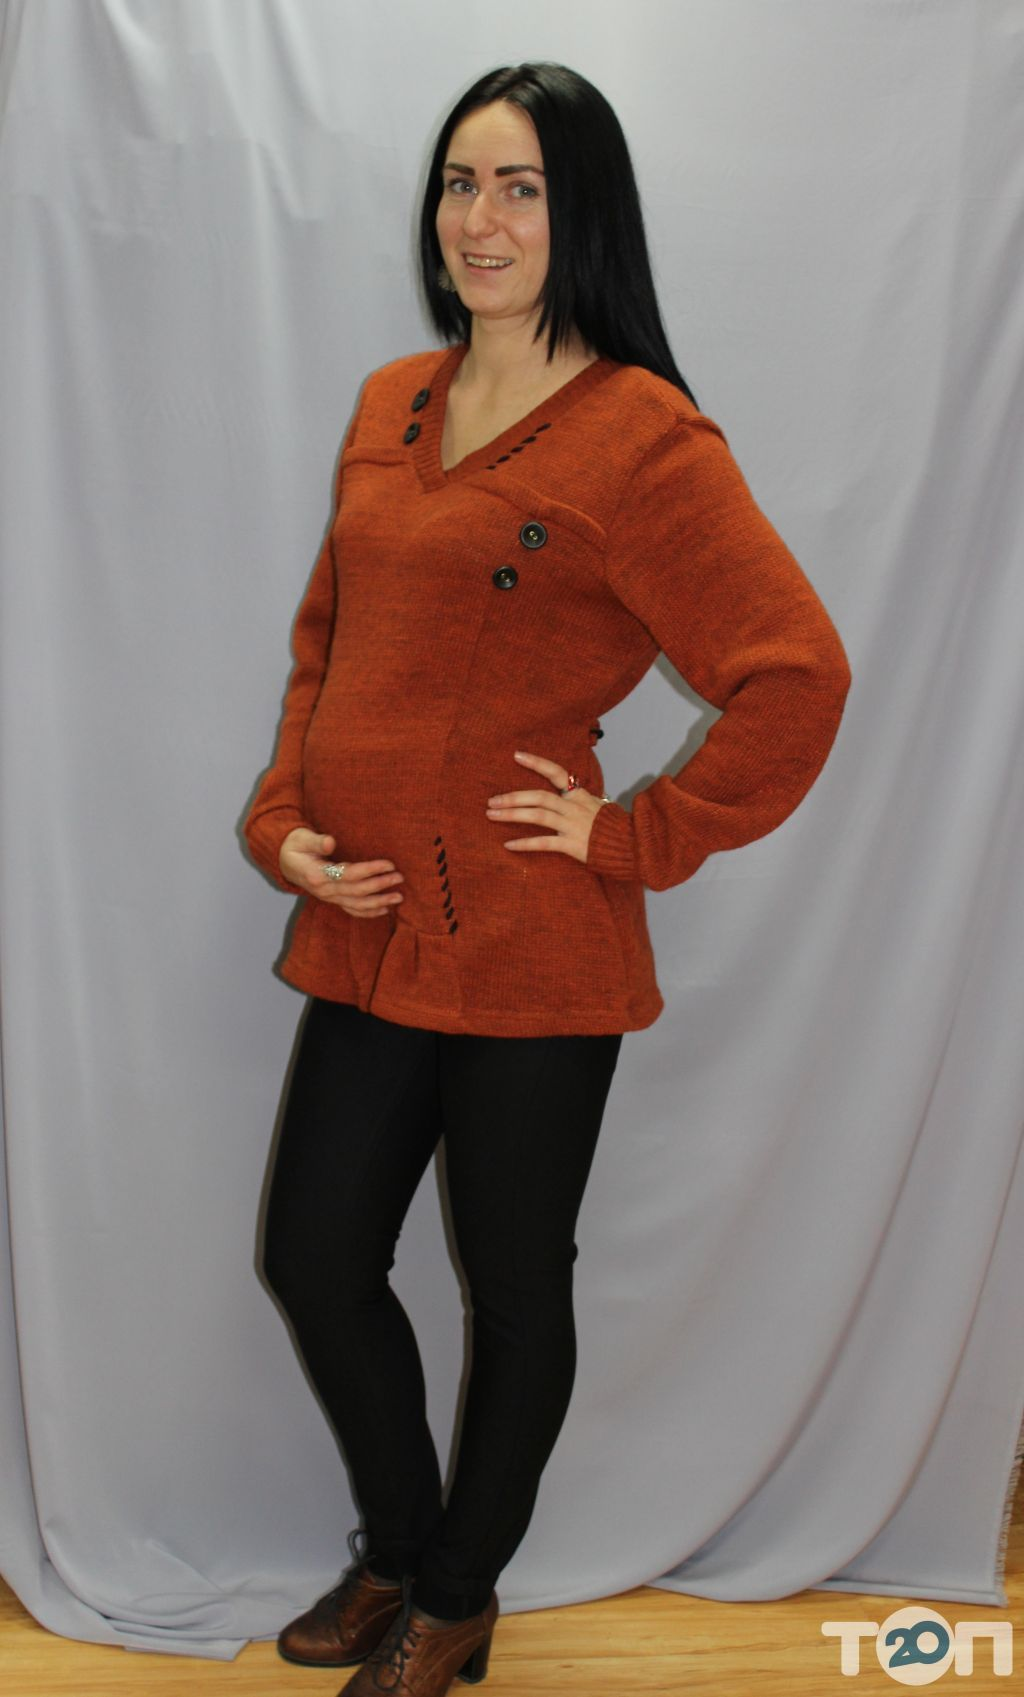 Дануся, одежда для беременных - фото 37